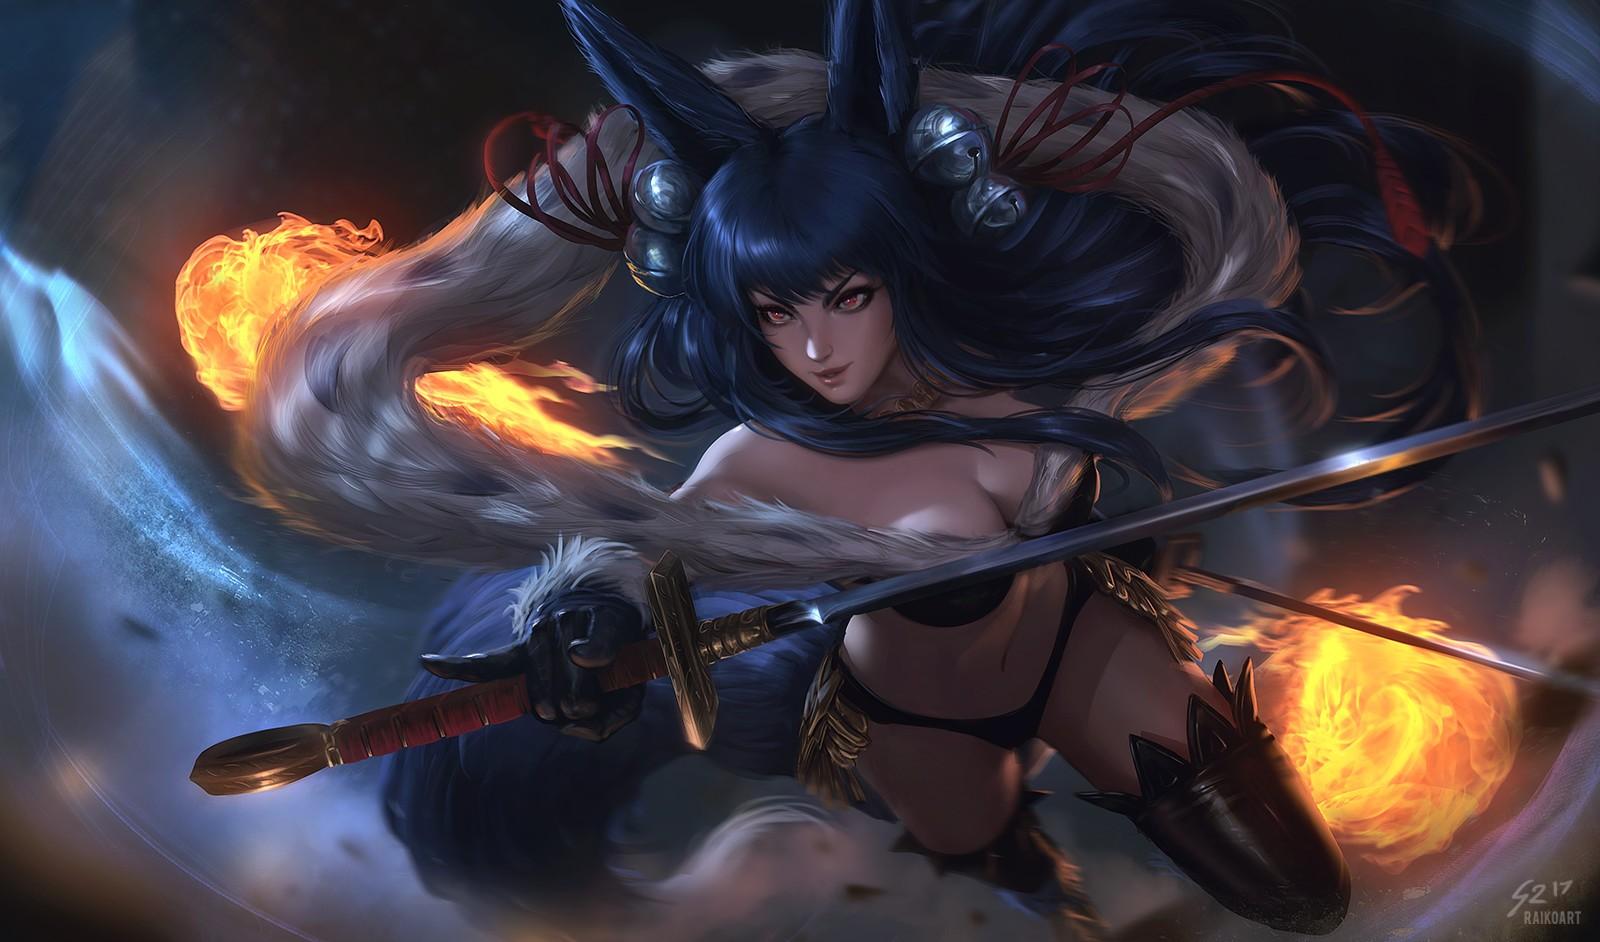 Wallpaper Magic League Of Legends Ahri League Of Legends